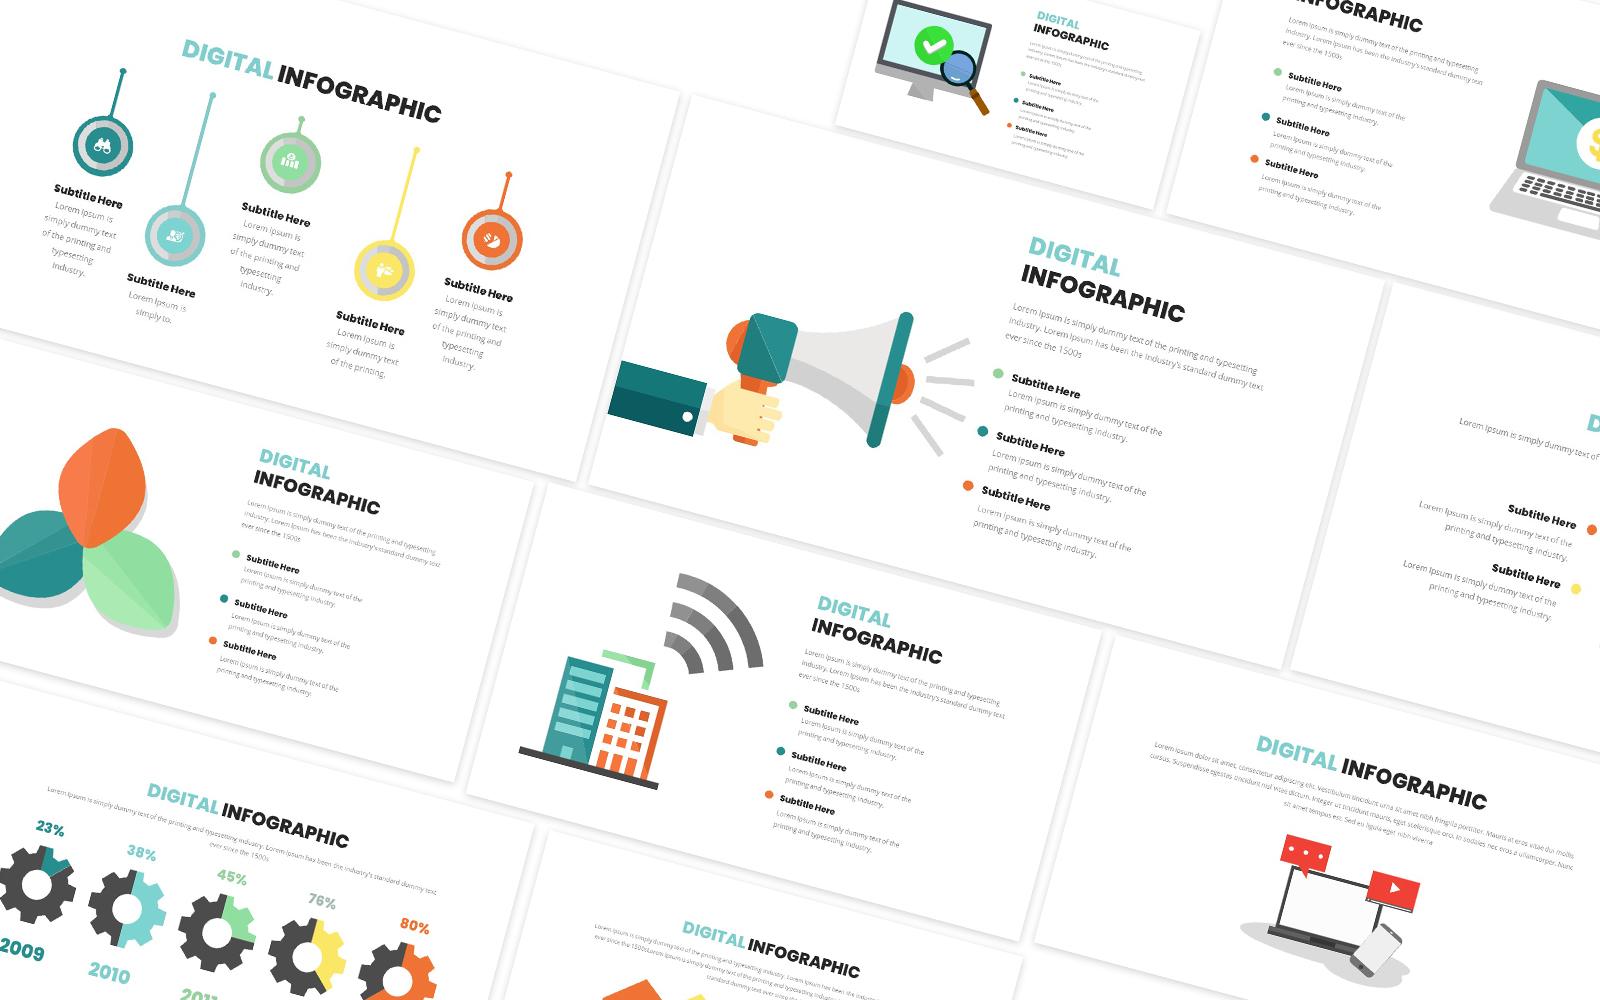 Digital Infographic Powerpoint